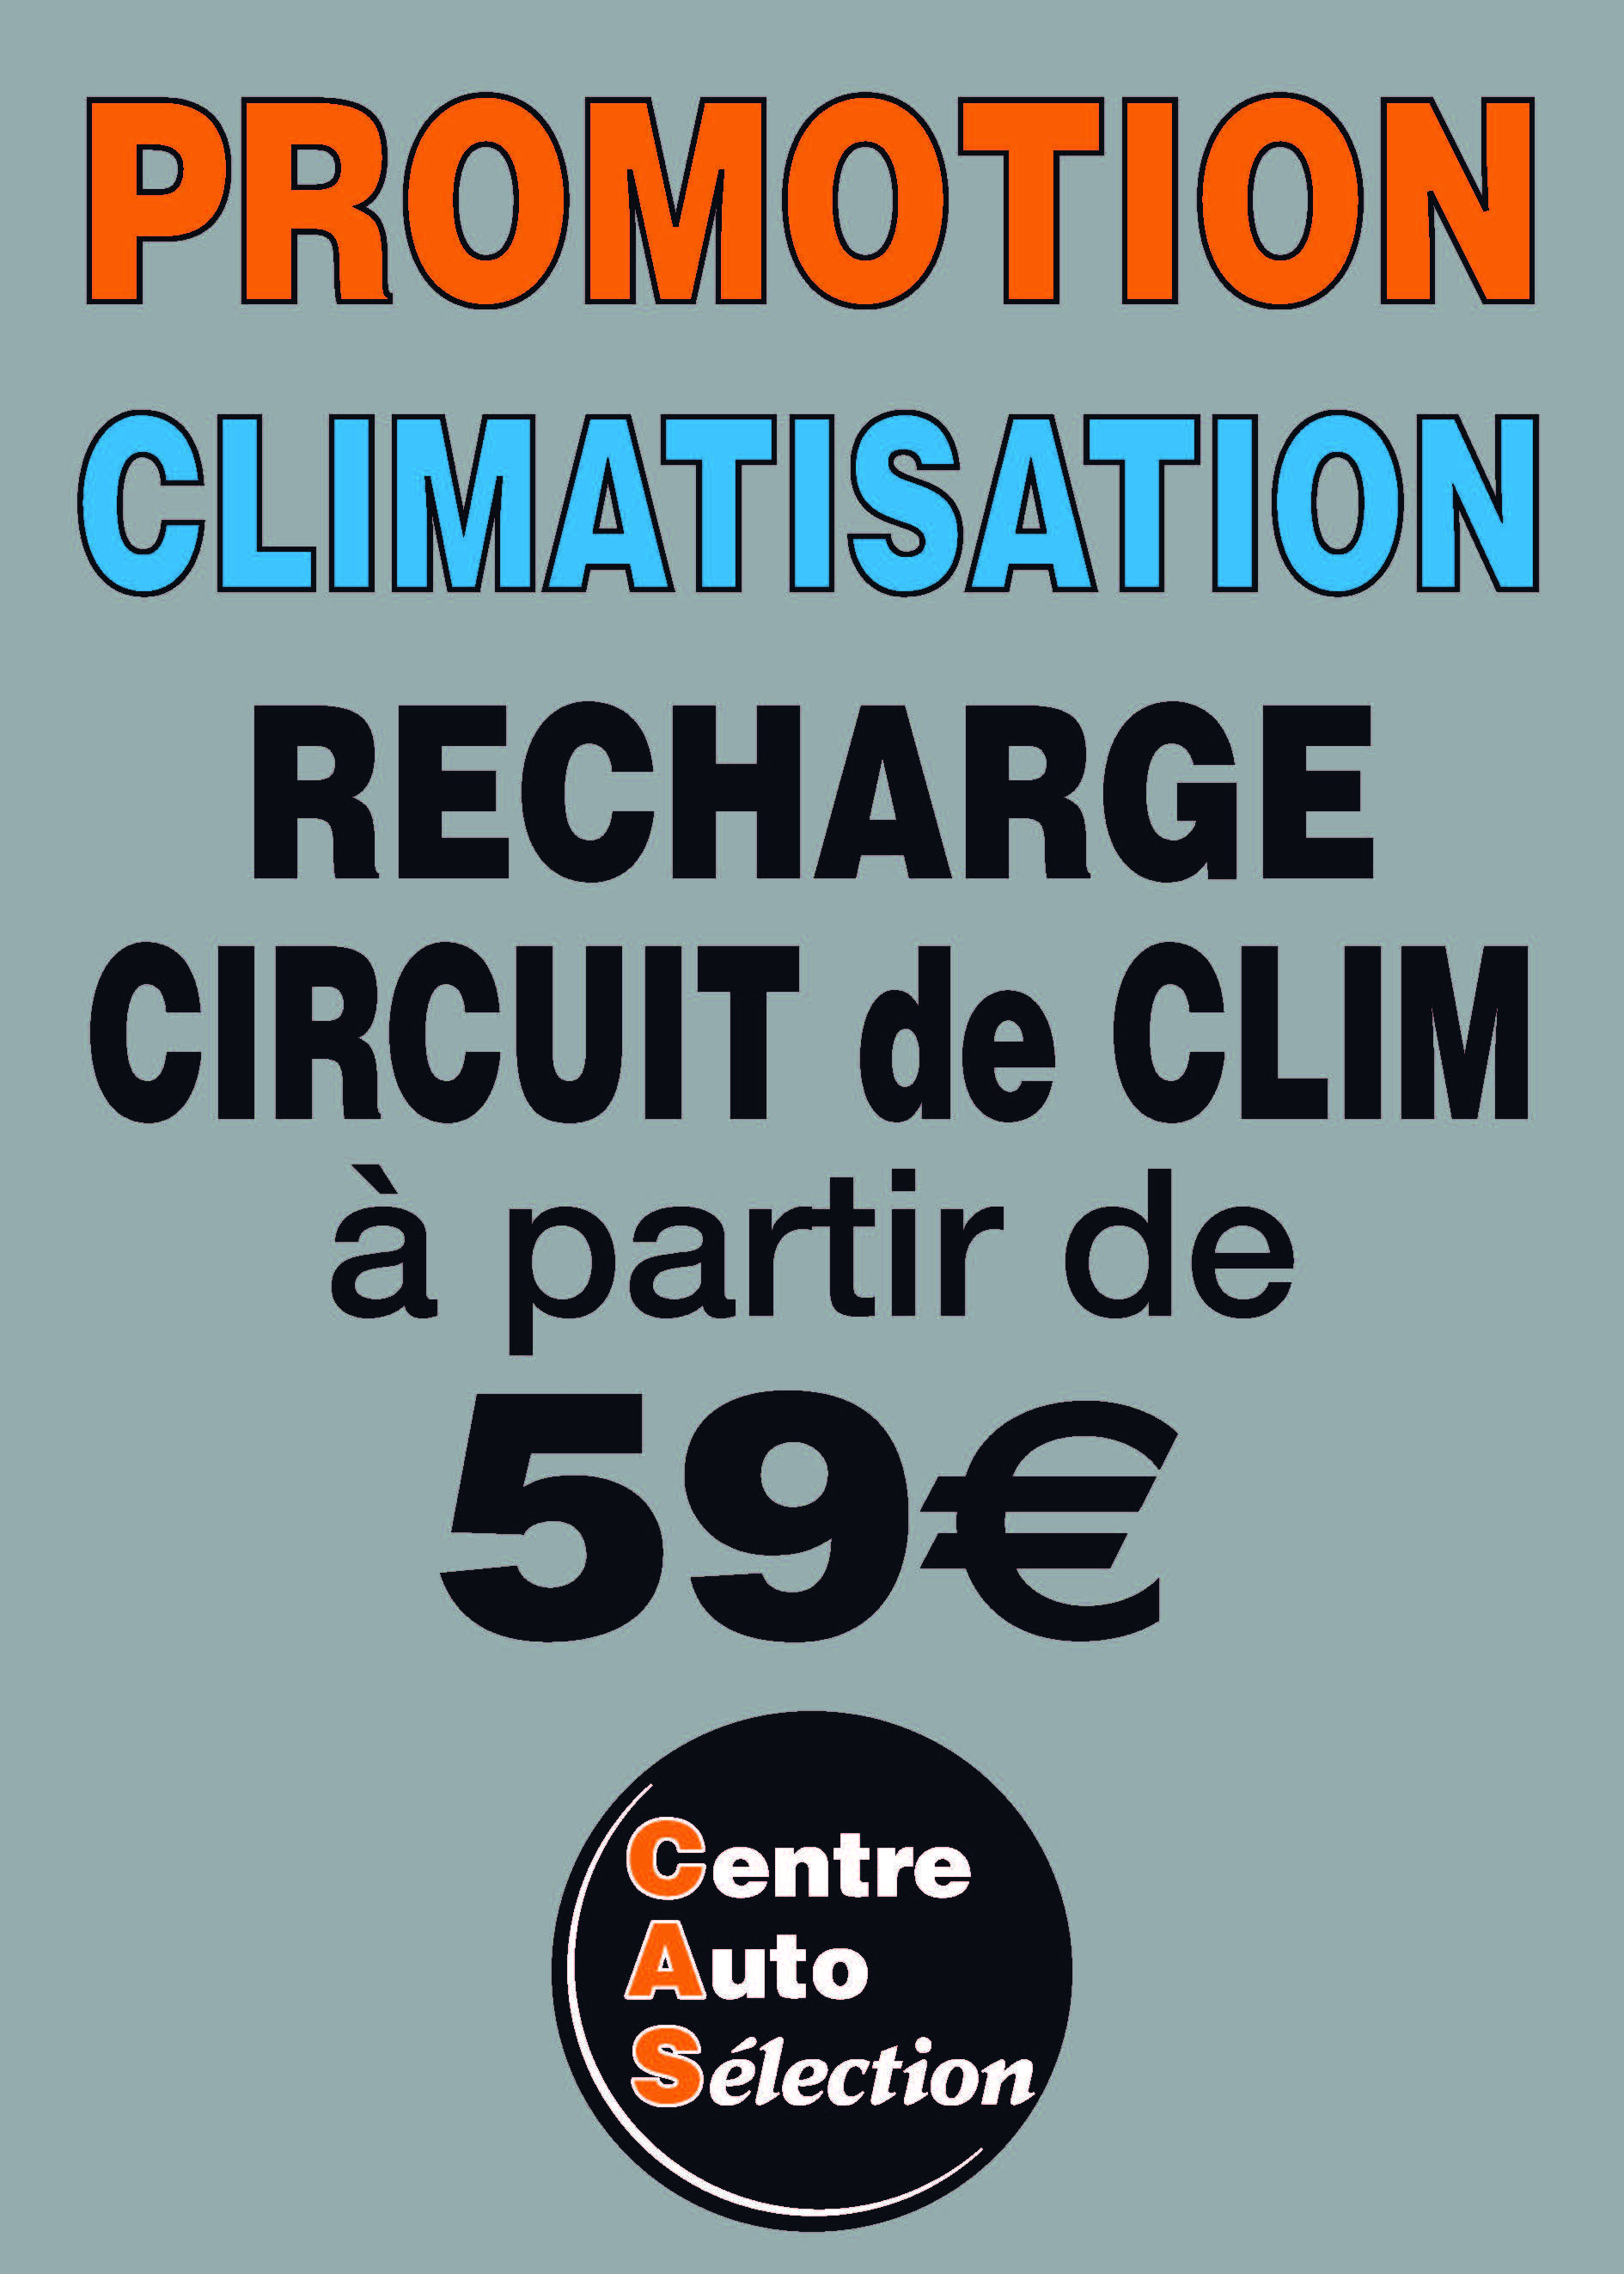 Promotion CLIMATISATION